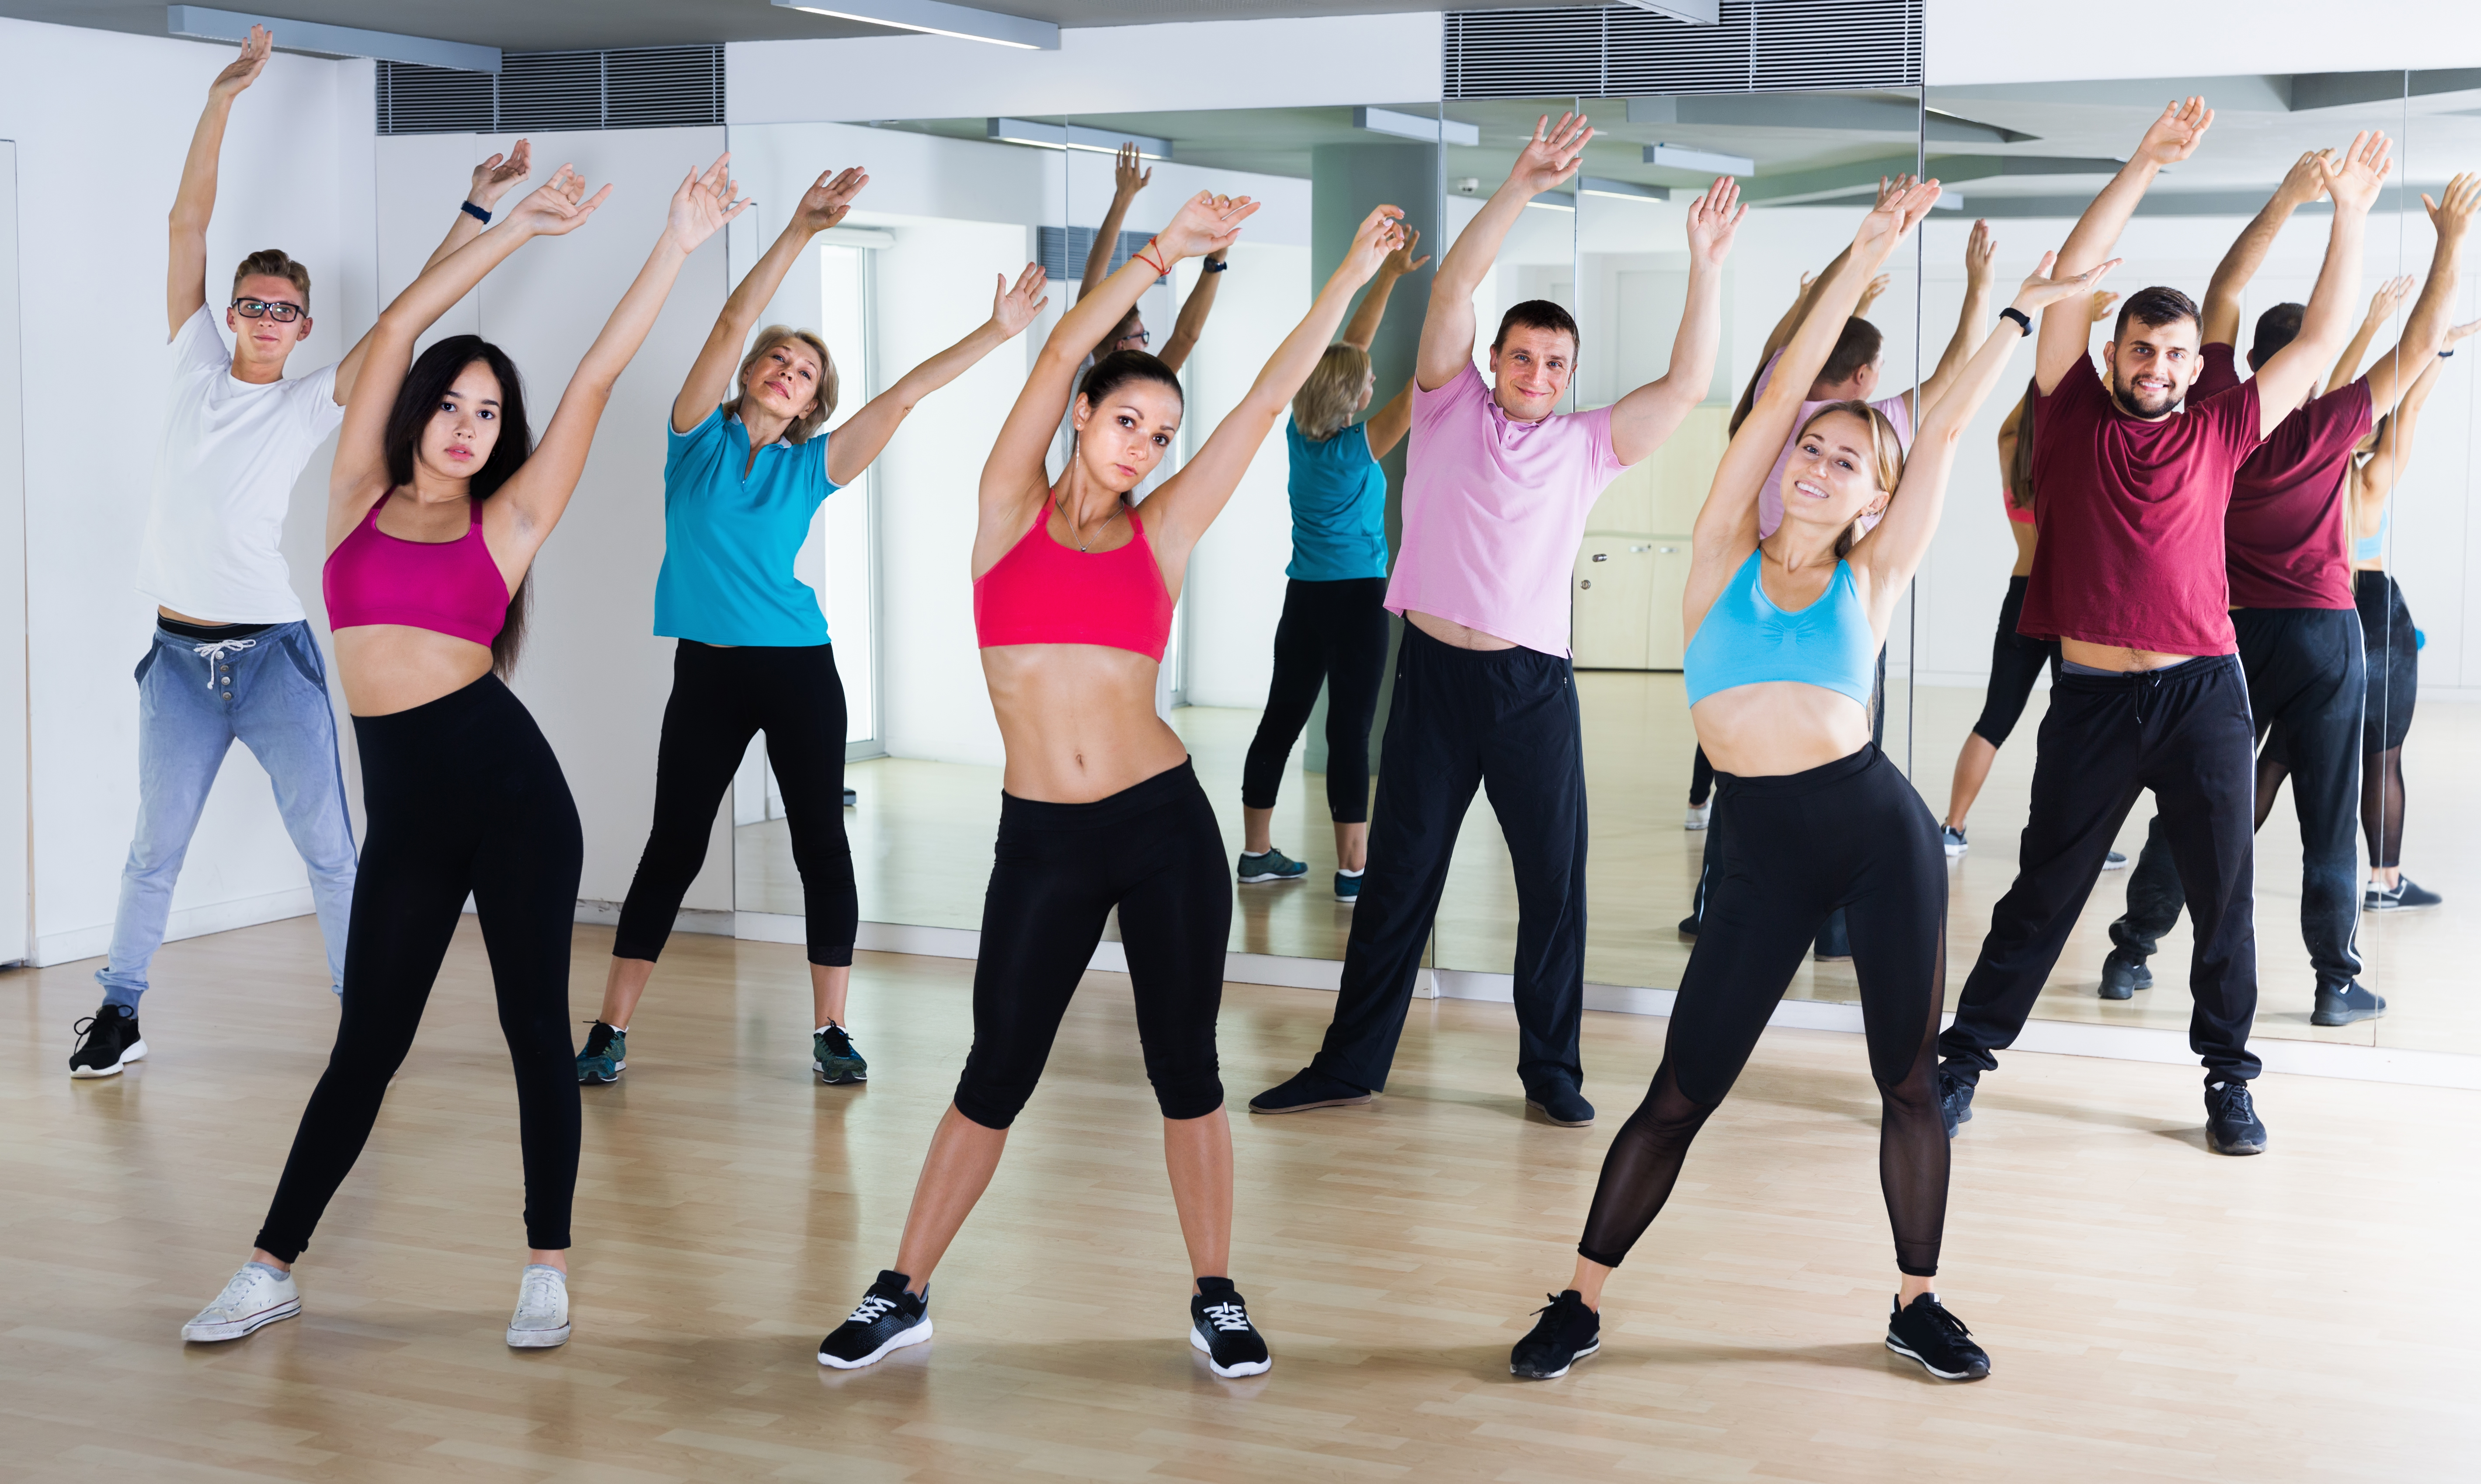 Basic Aerobic Dance Steps Two Step Diagrams